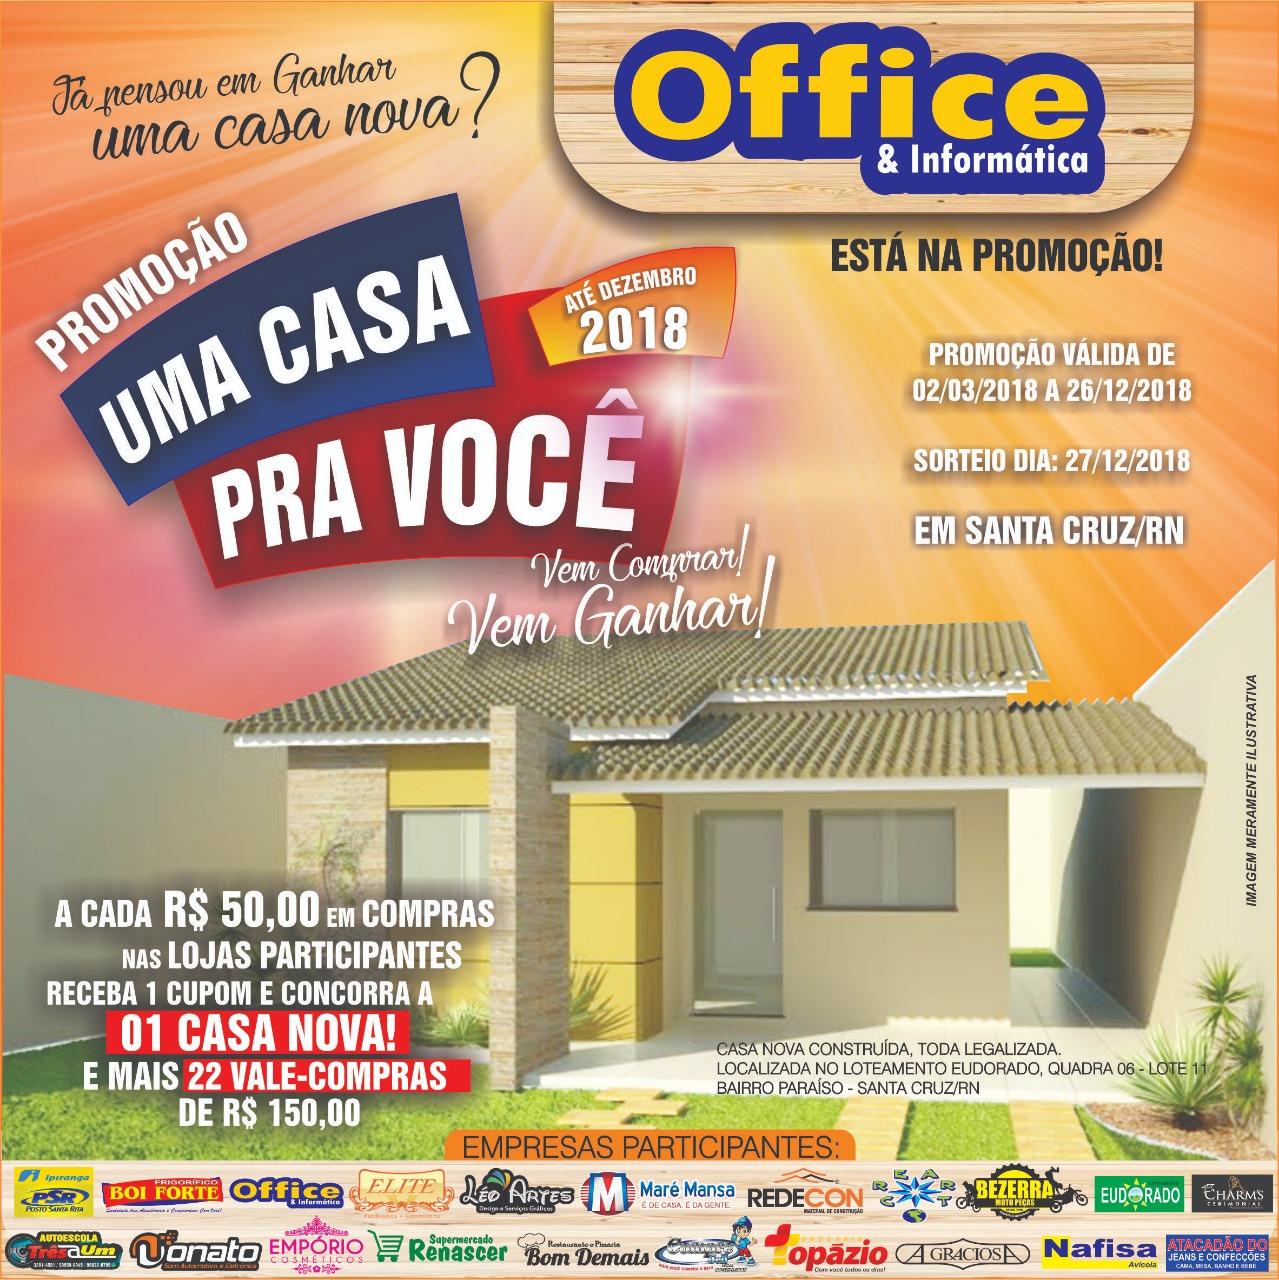 OFFICE & INFORMÁTICA